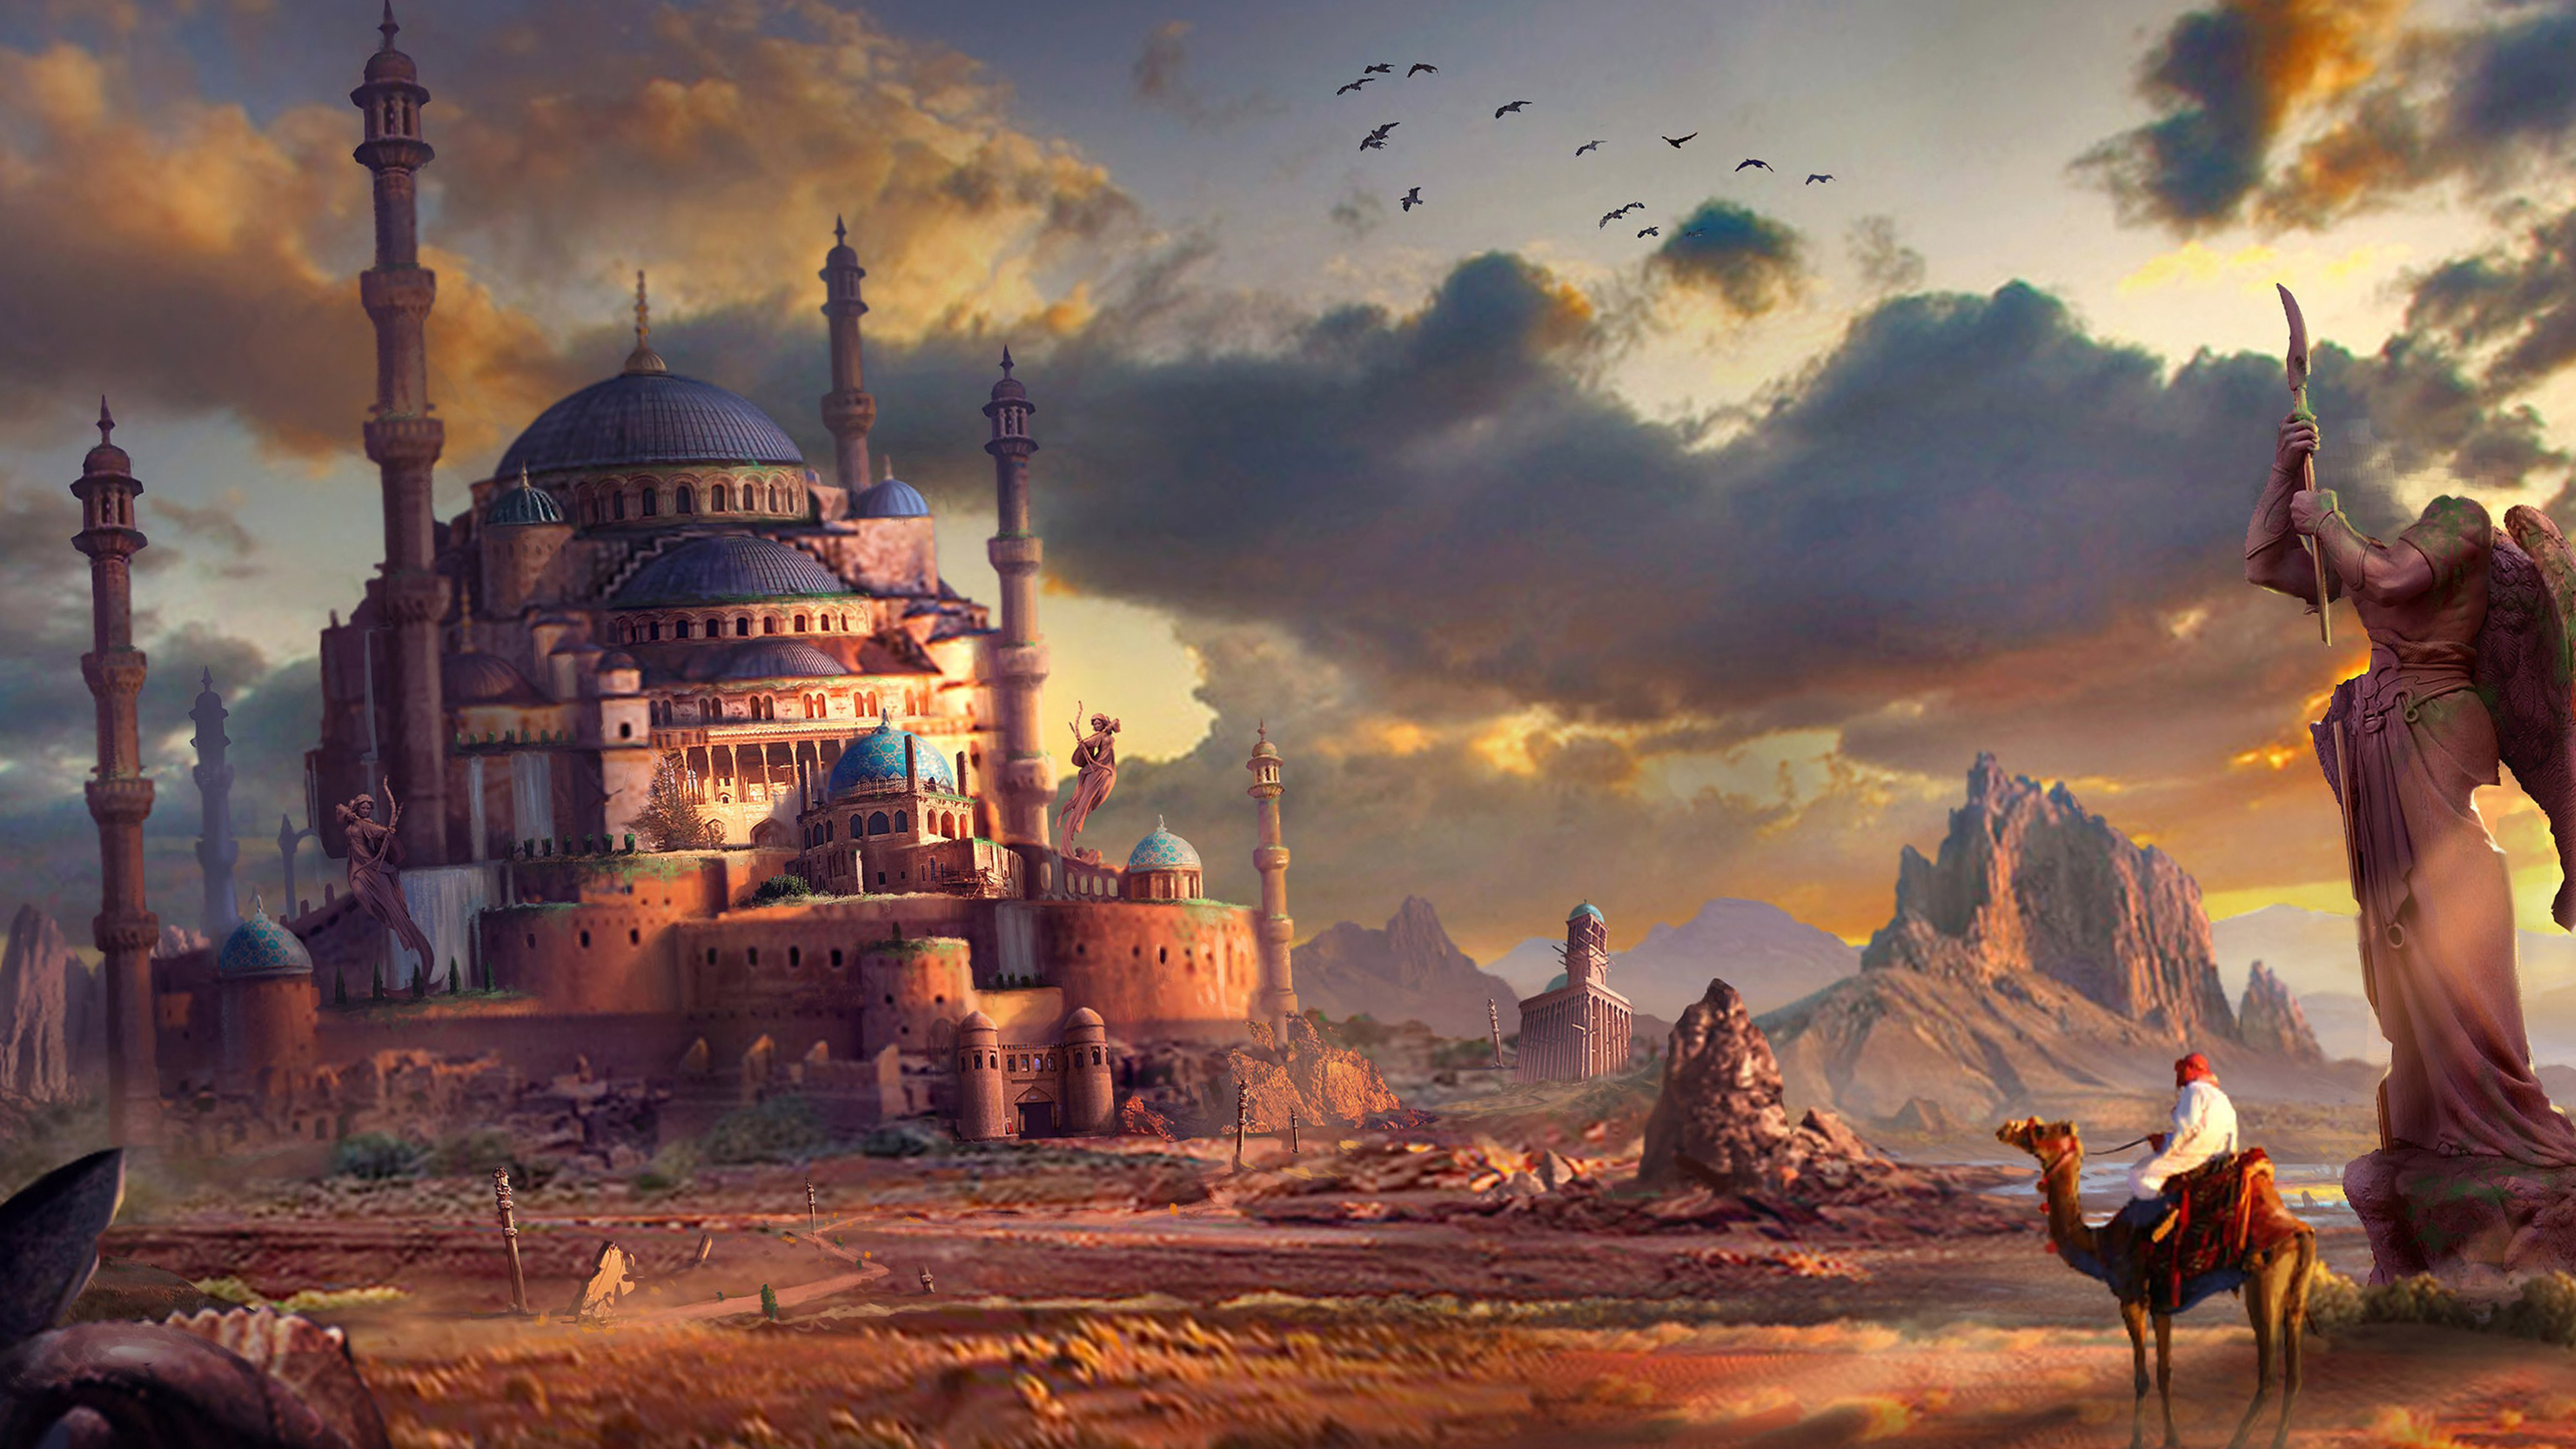 free download wallpapers arab - photo #21